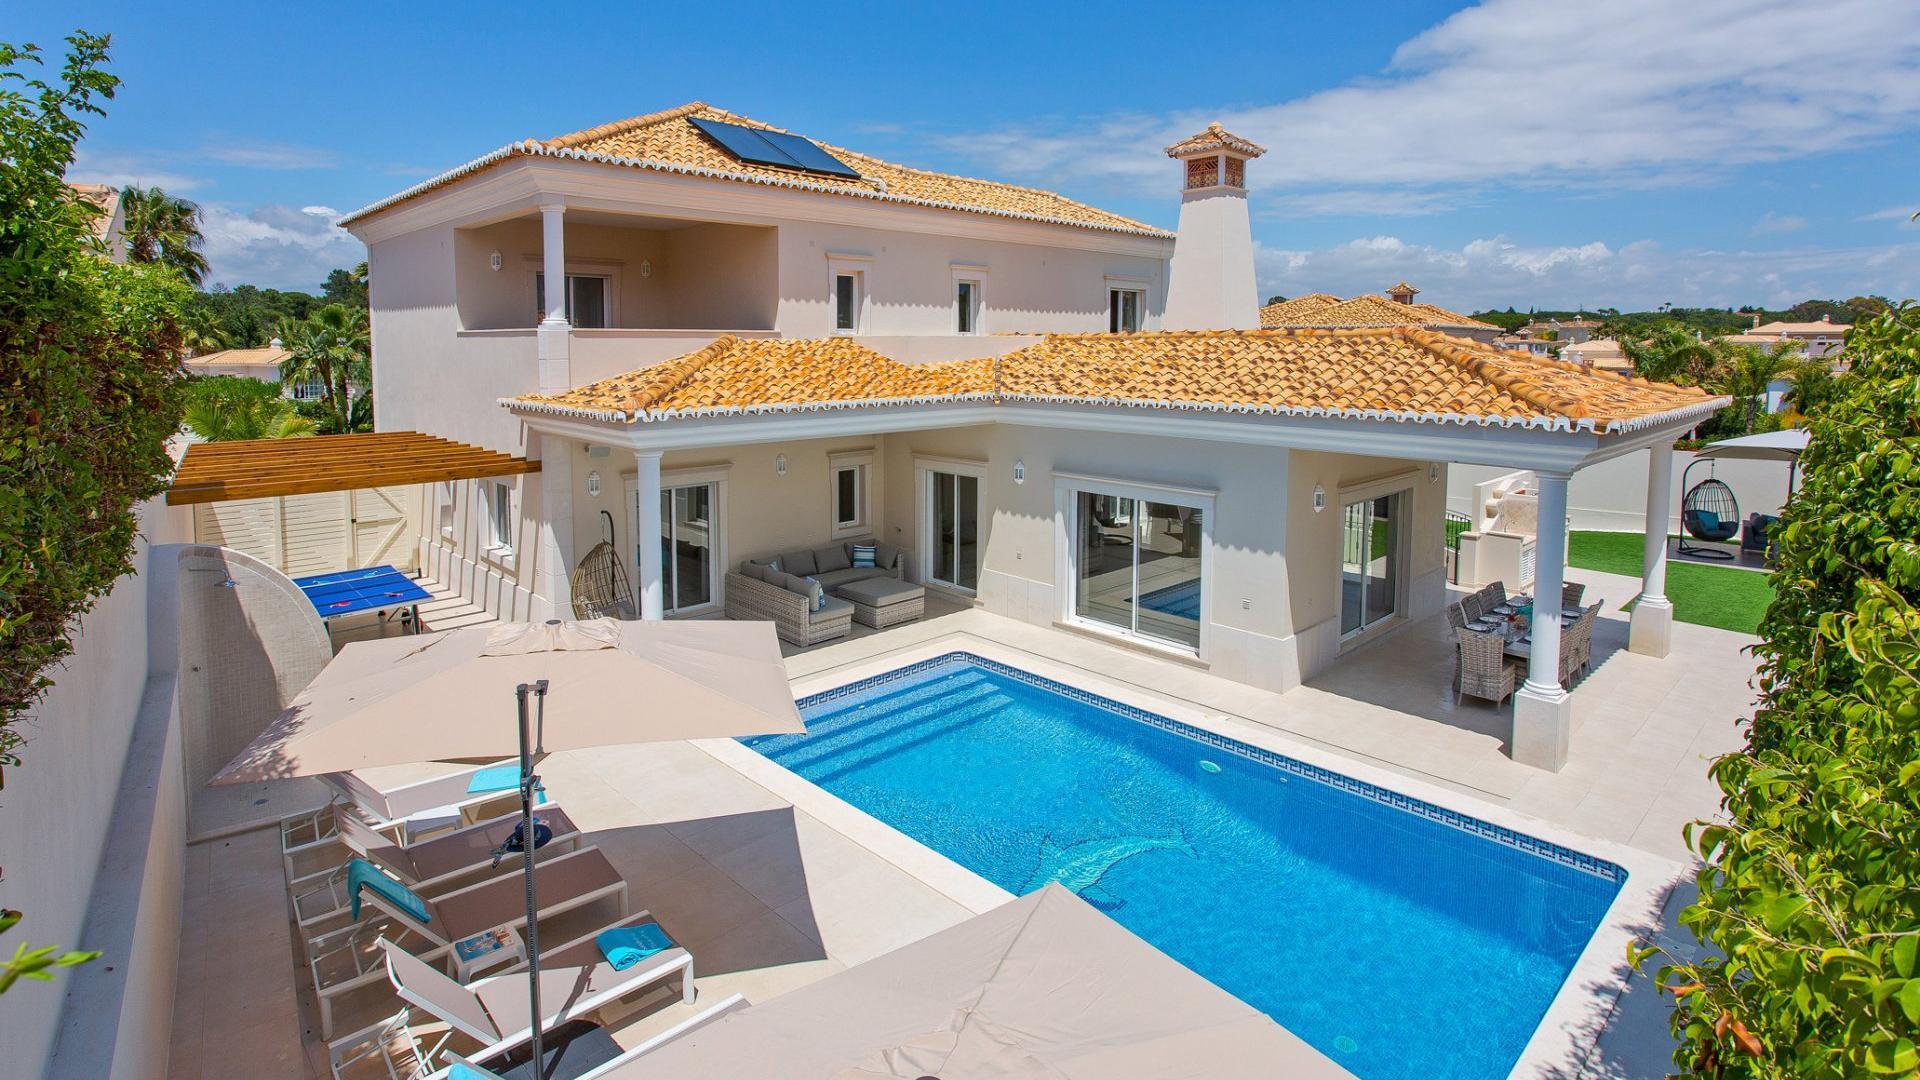 Villa Augusta - Varandas do Lago, Quinta do Lago, Algarve - _P1_9074.jpg